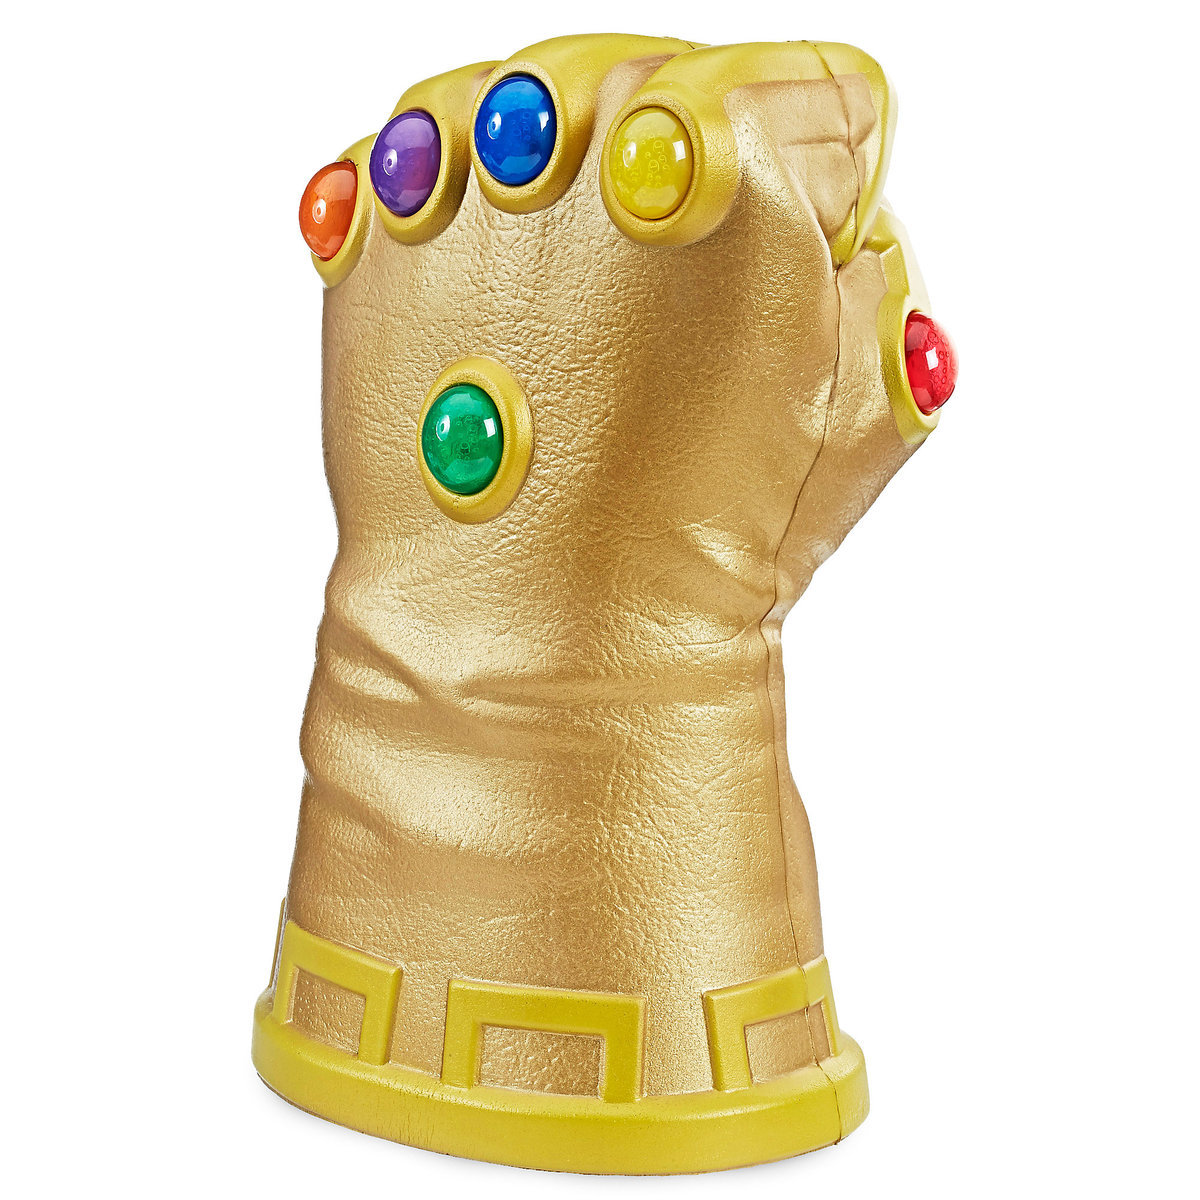 Marvel's Avengers: Infinity War Merchandise at ShopDisney! #disneystyle 3